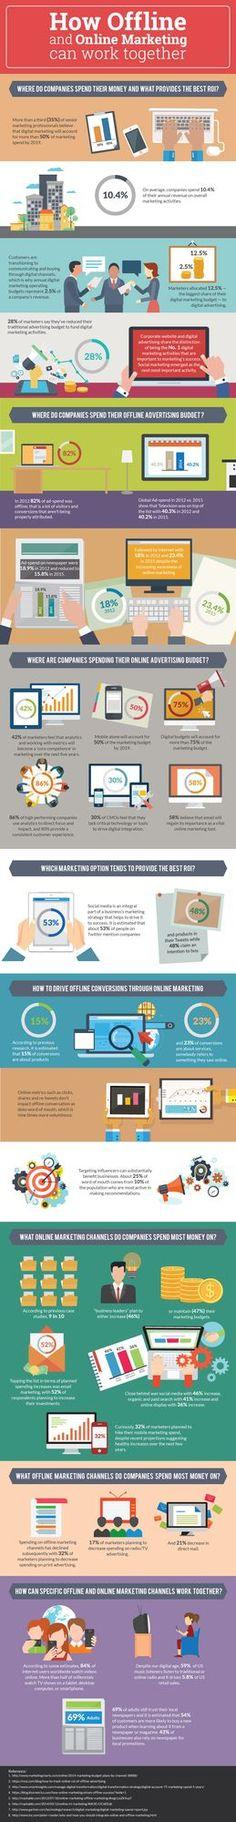 How Online & Offline Marketing Can Work Together [Infographic] | HubSpot's Inbound Internet Marketing Blog | Bloglovin'